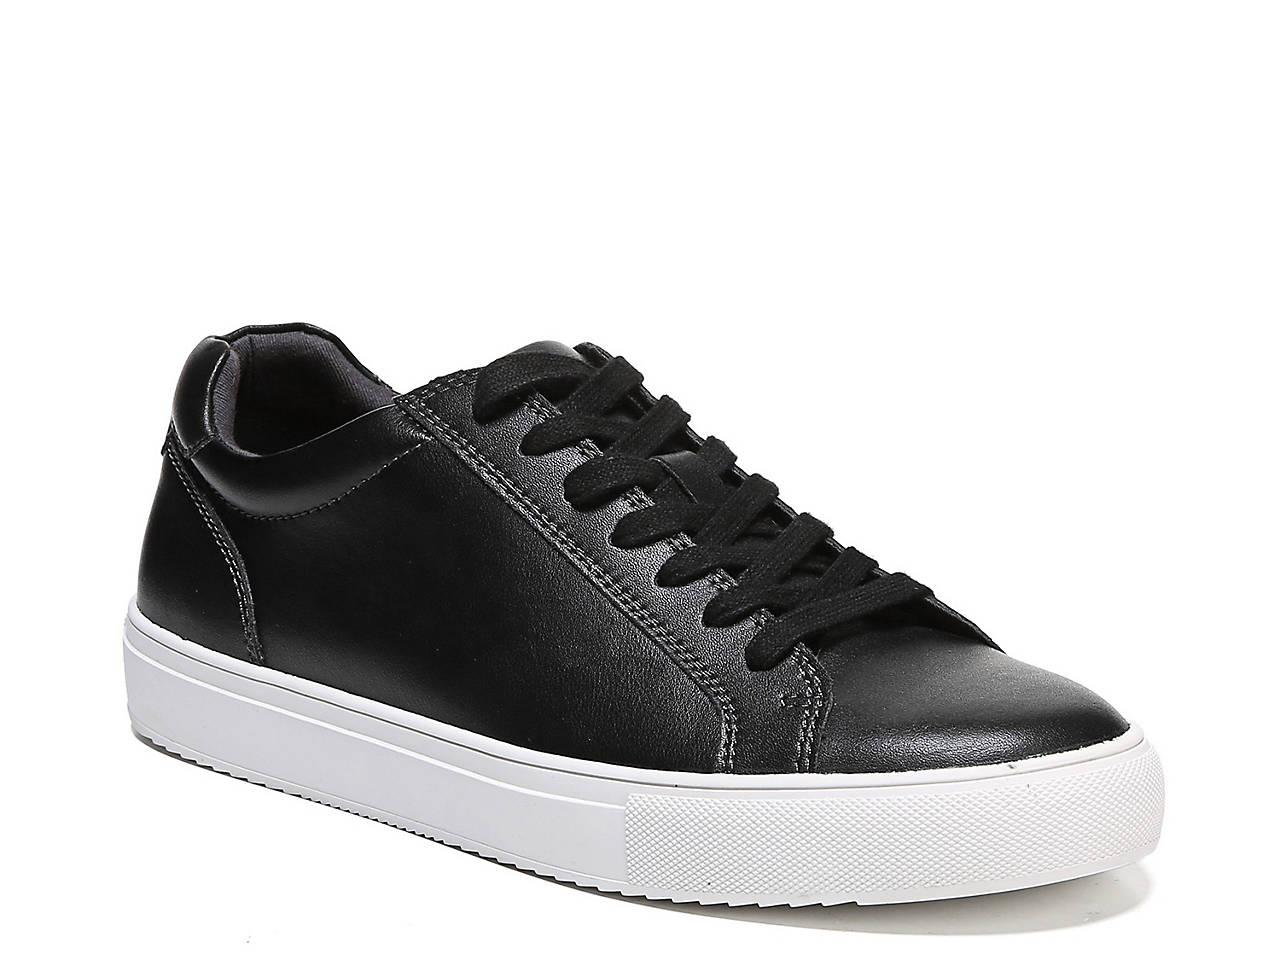 Renegade Sneaker by Dr. Scholl's